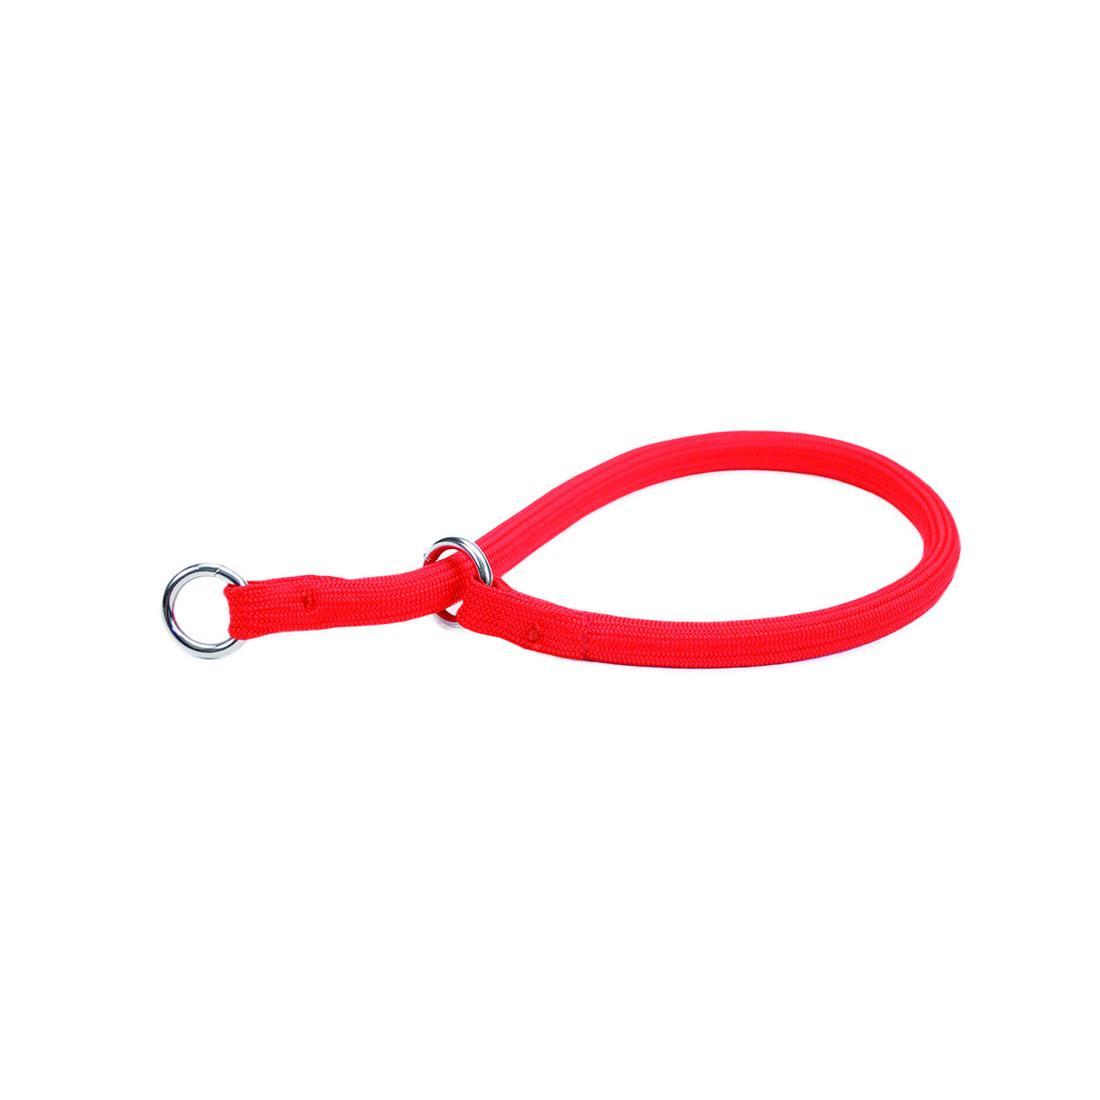 Coastal Round Nylon Dog Training Collar, Red, 3/8-in x 22-in